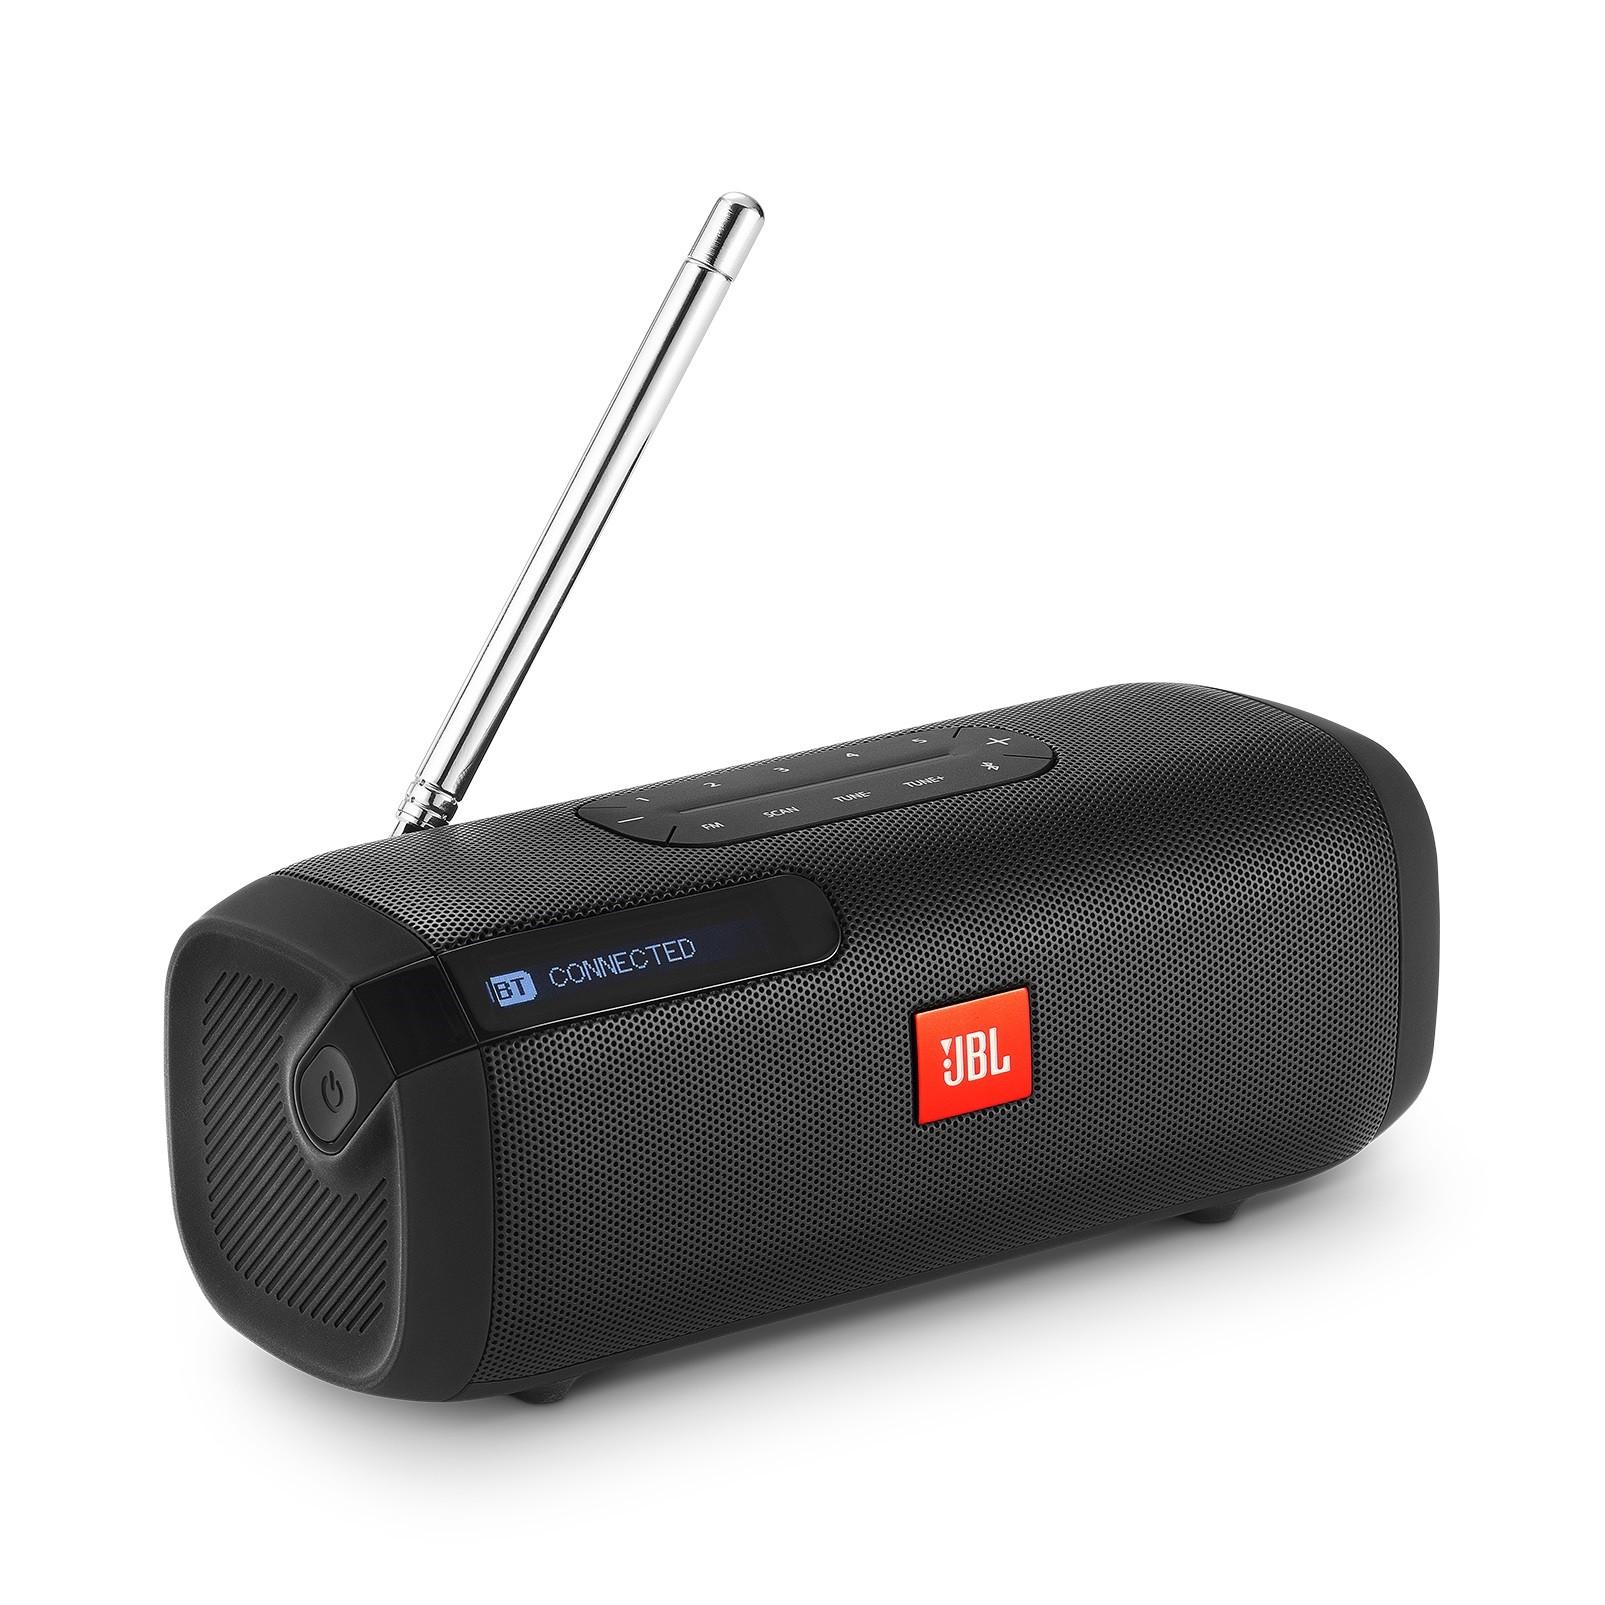 Caixa de Som Bluetooth JBL Tunner P2FM Preto 1500 mAh - 913027